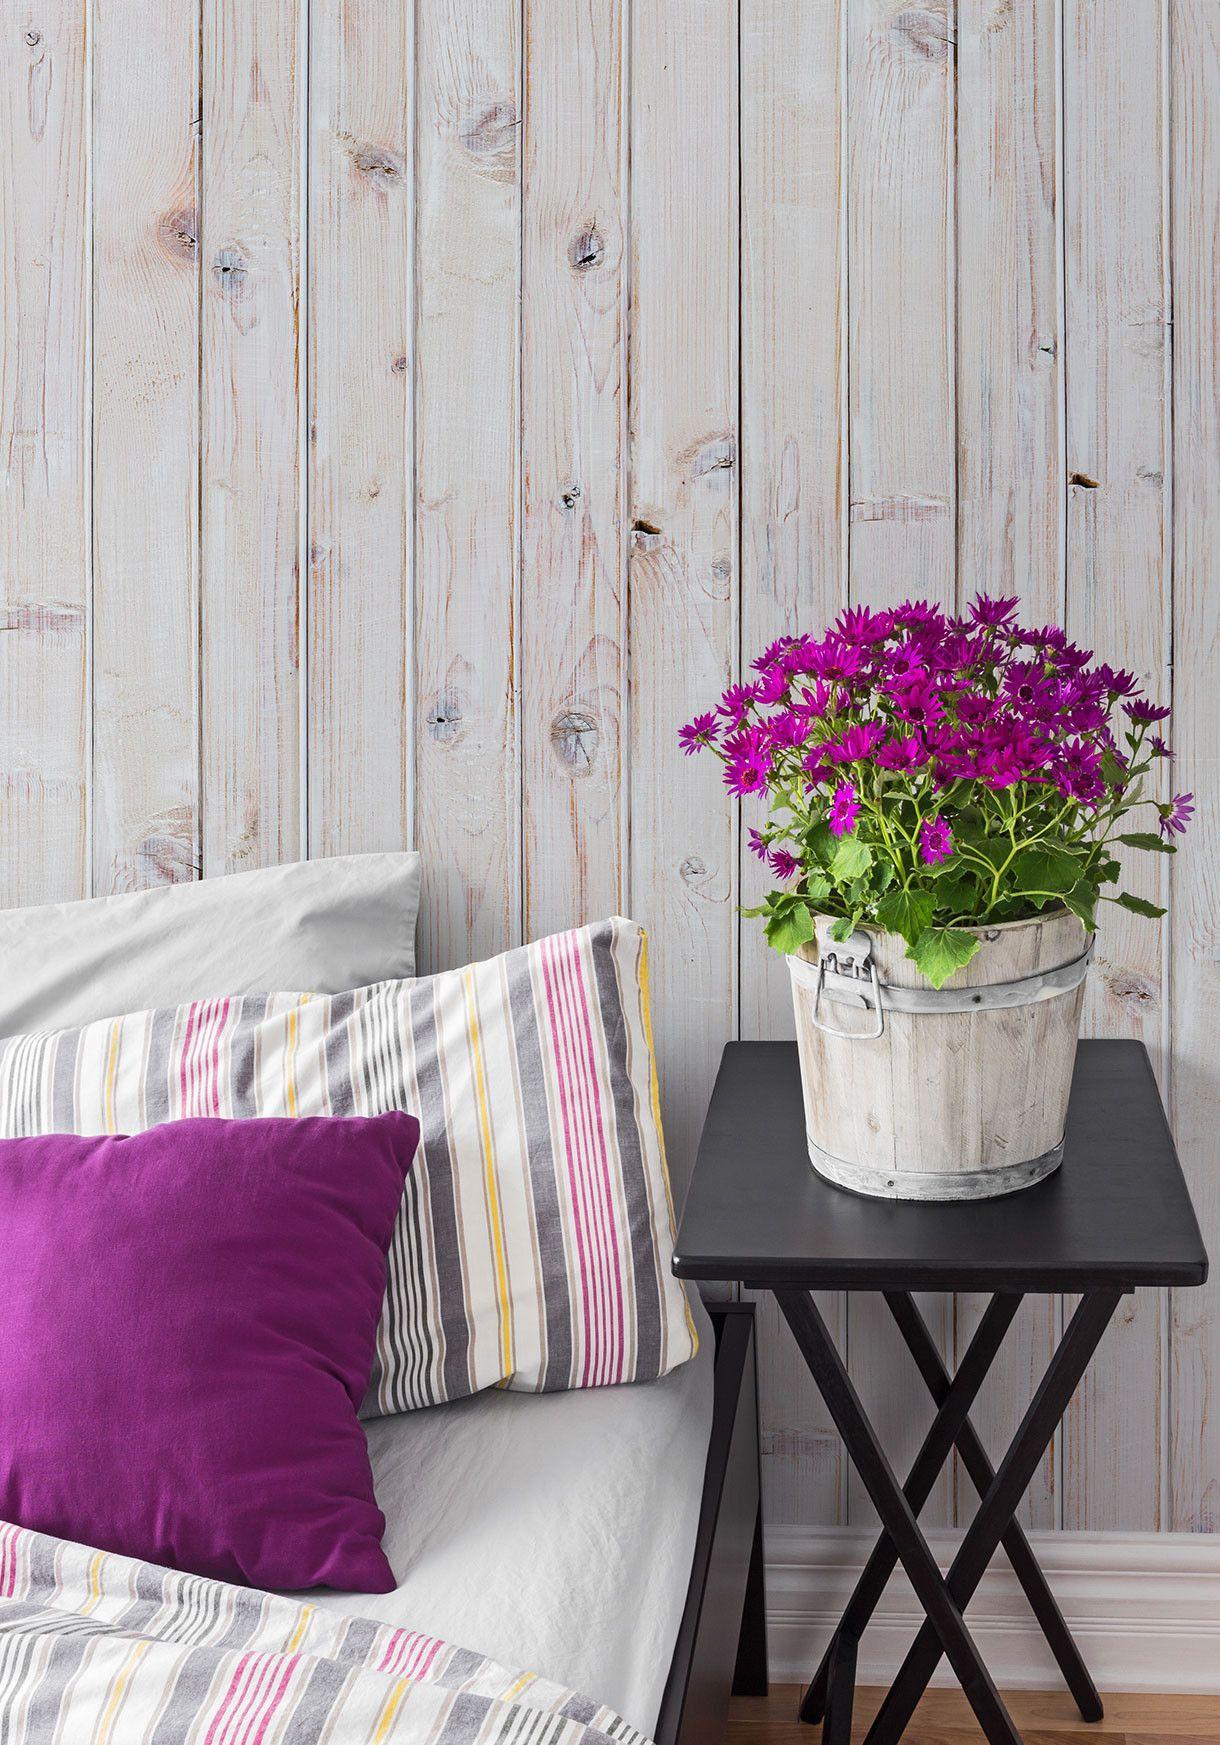 spelndid popular wallpaper designs. Newport Wallpaper design by Milton  King is a splendid faux wallpaper that unobtrusive and sure